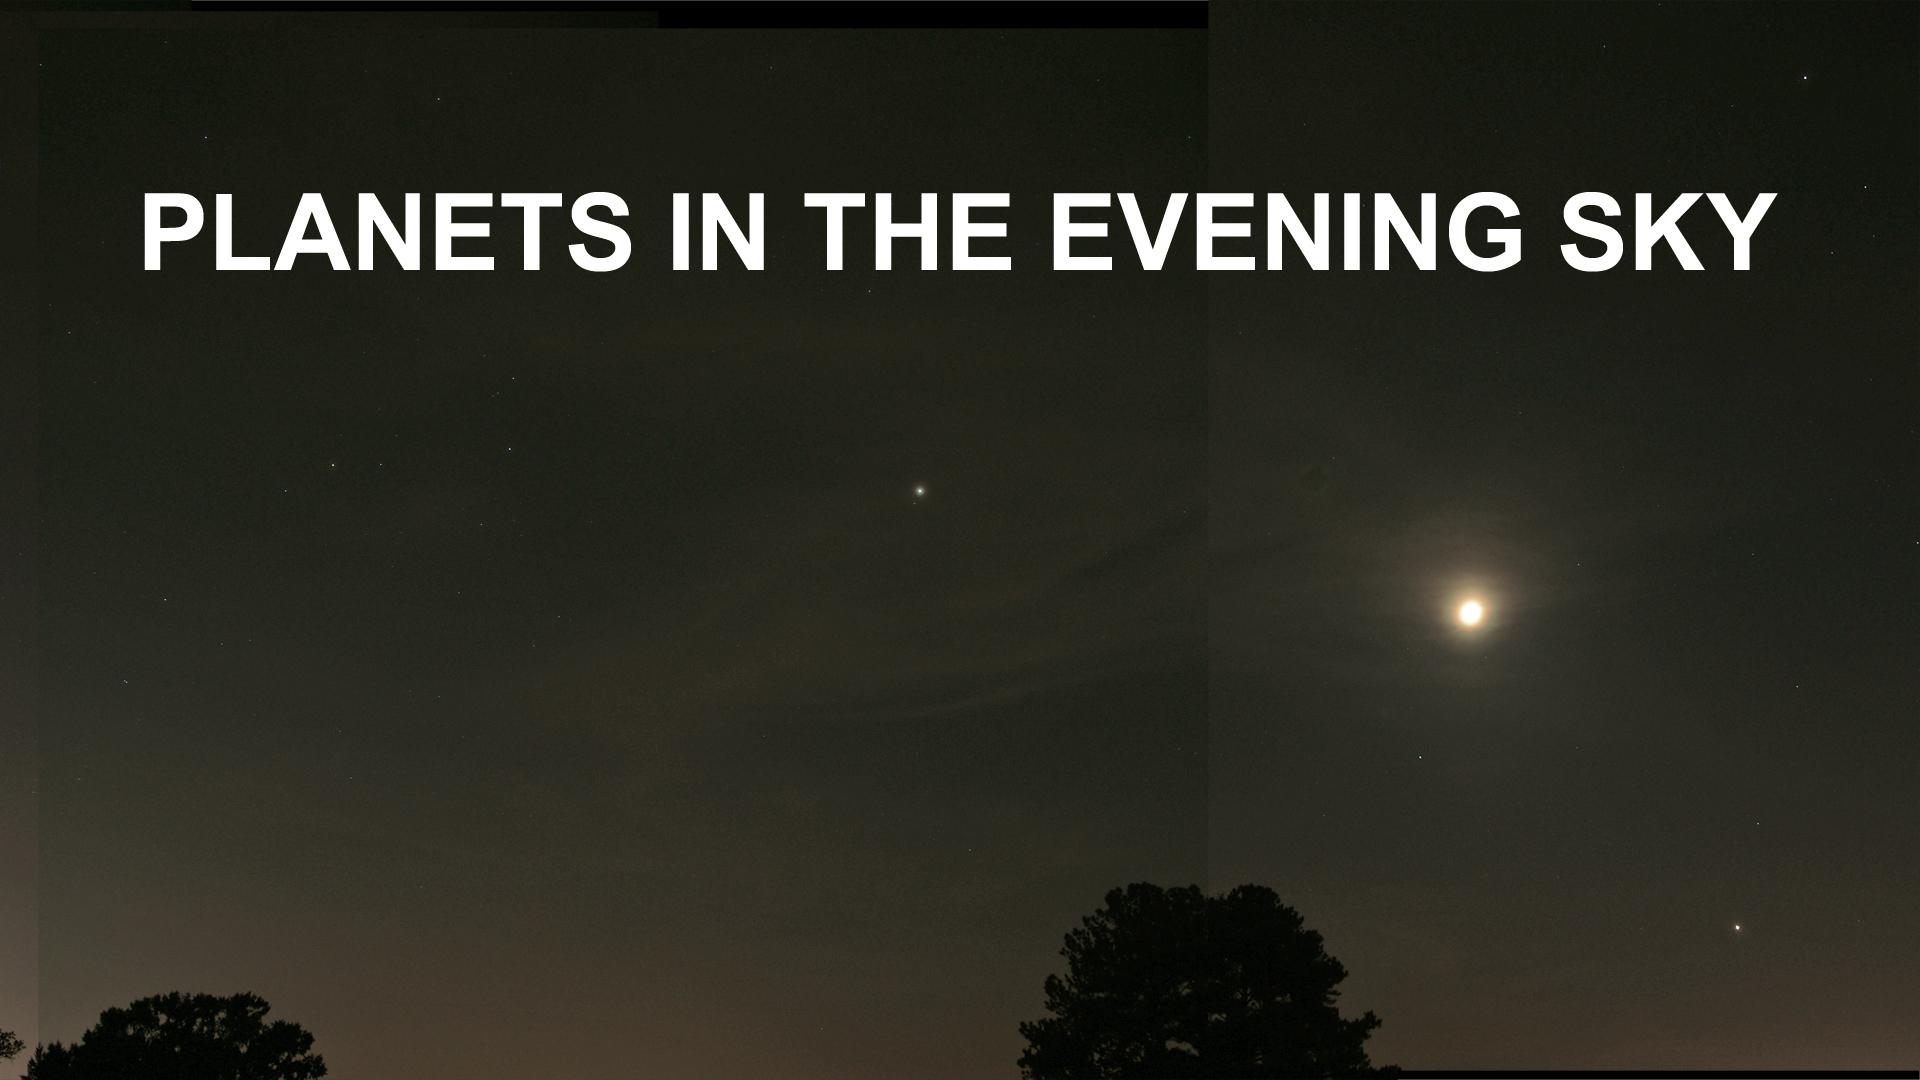 Evening sky presents planets.jpg